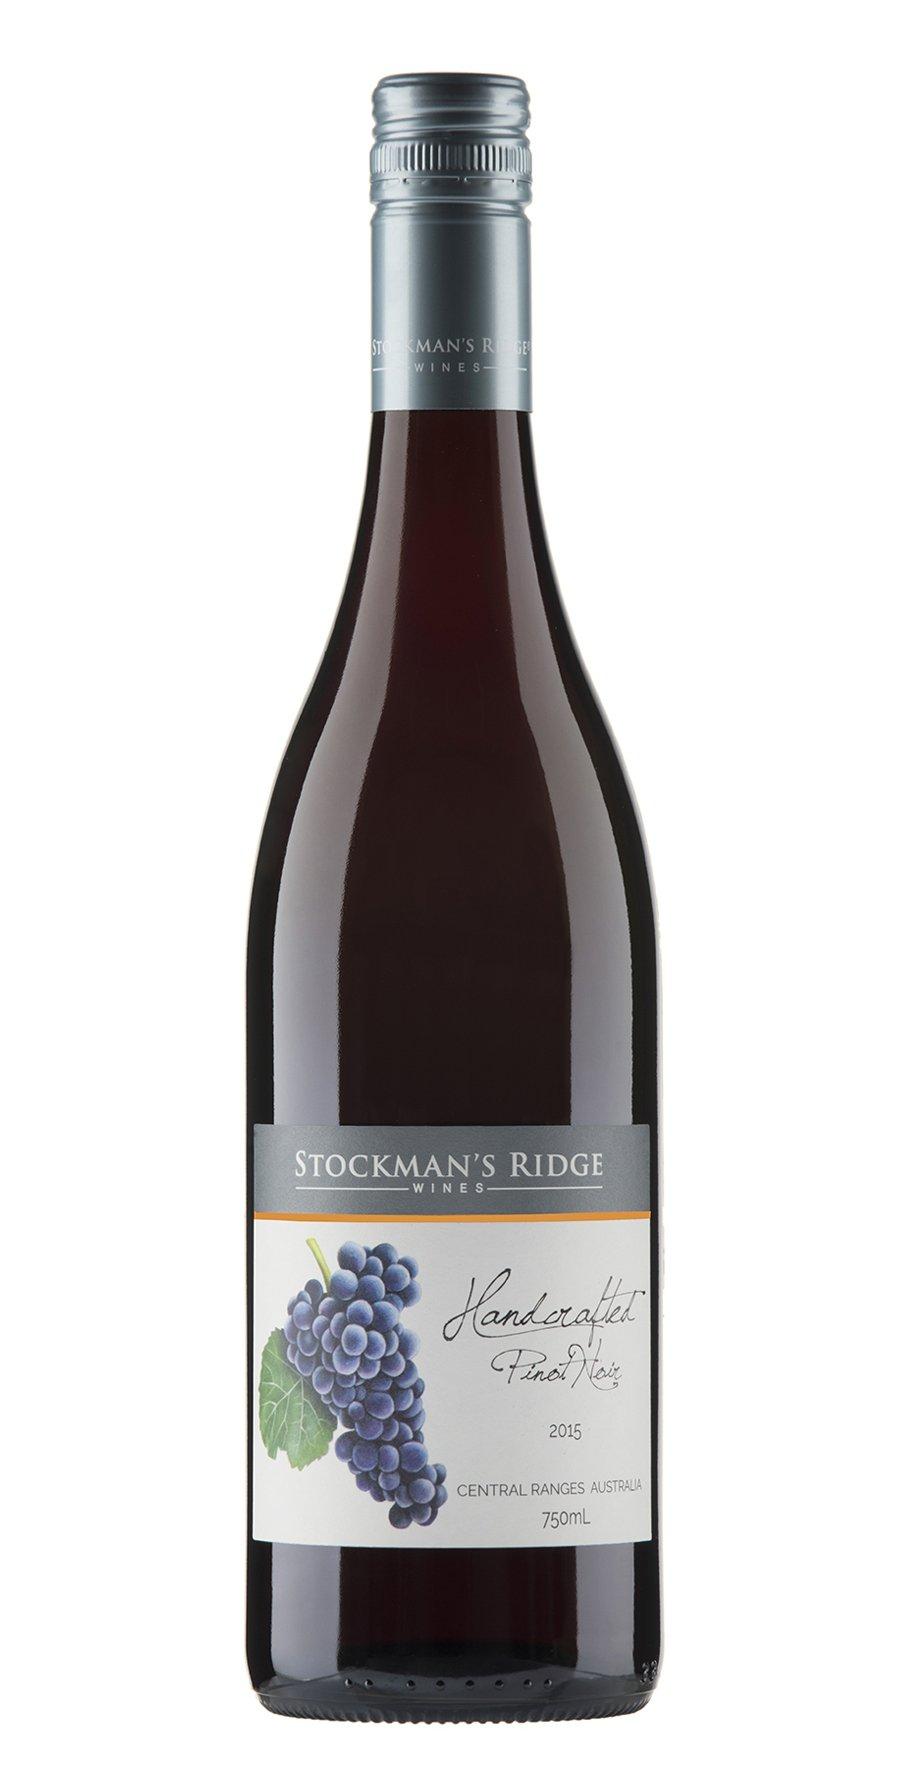 Stockmans Ridge 2015 Handcrafted Pinot Noir